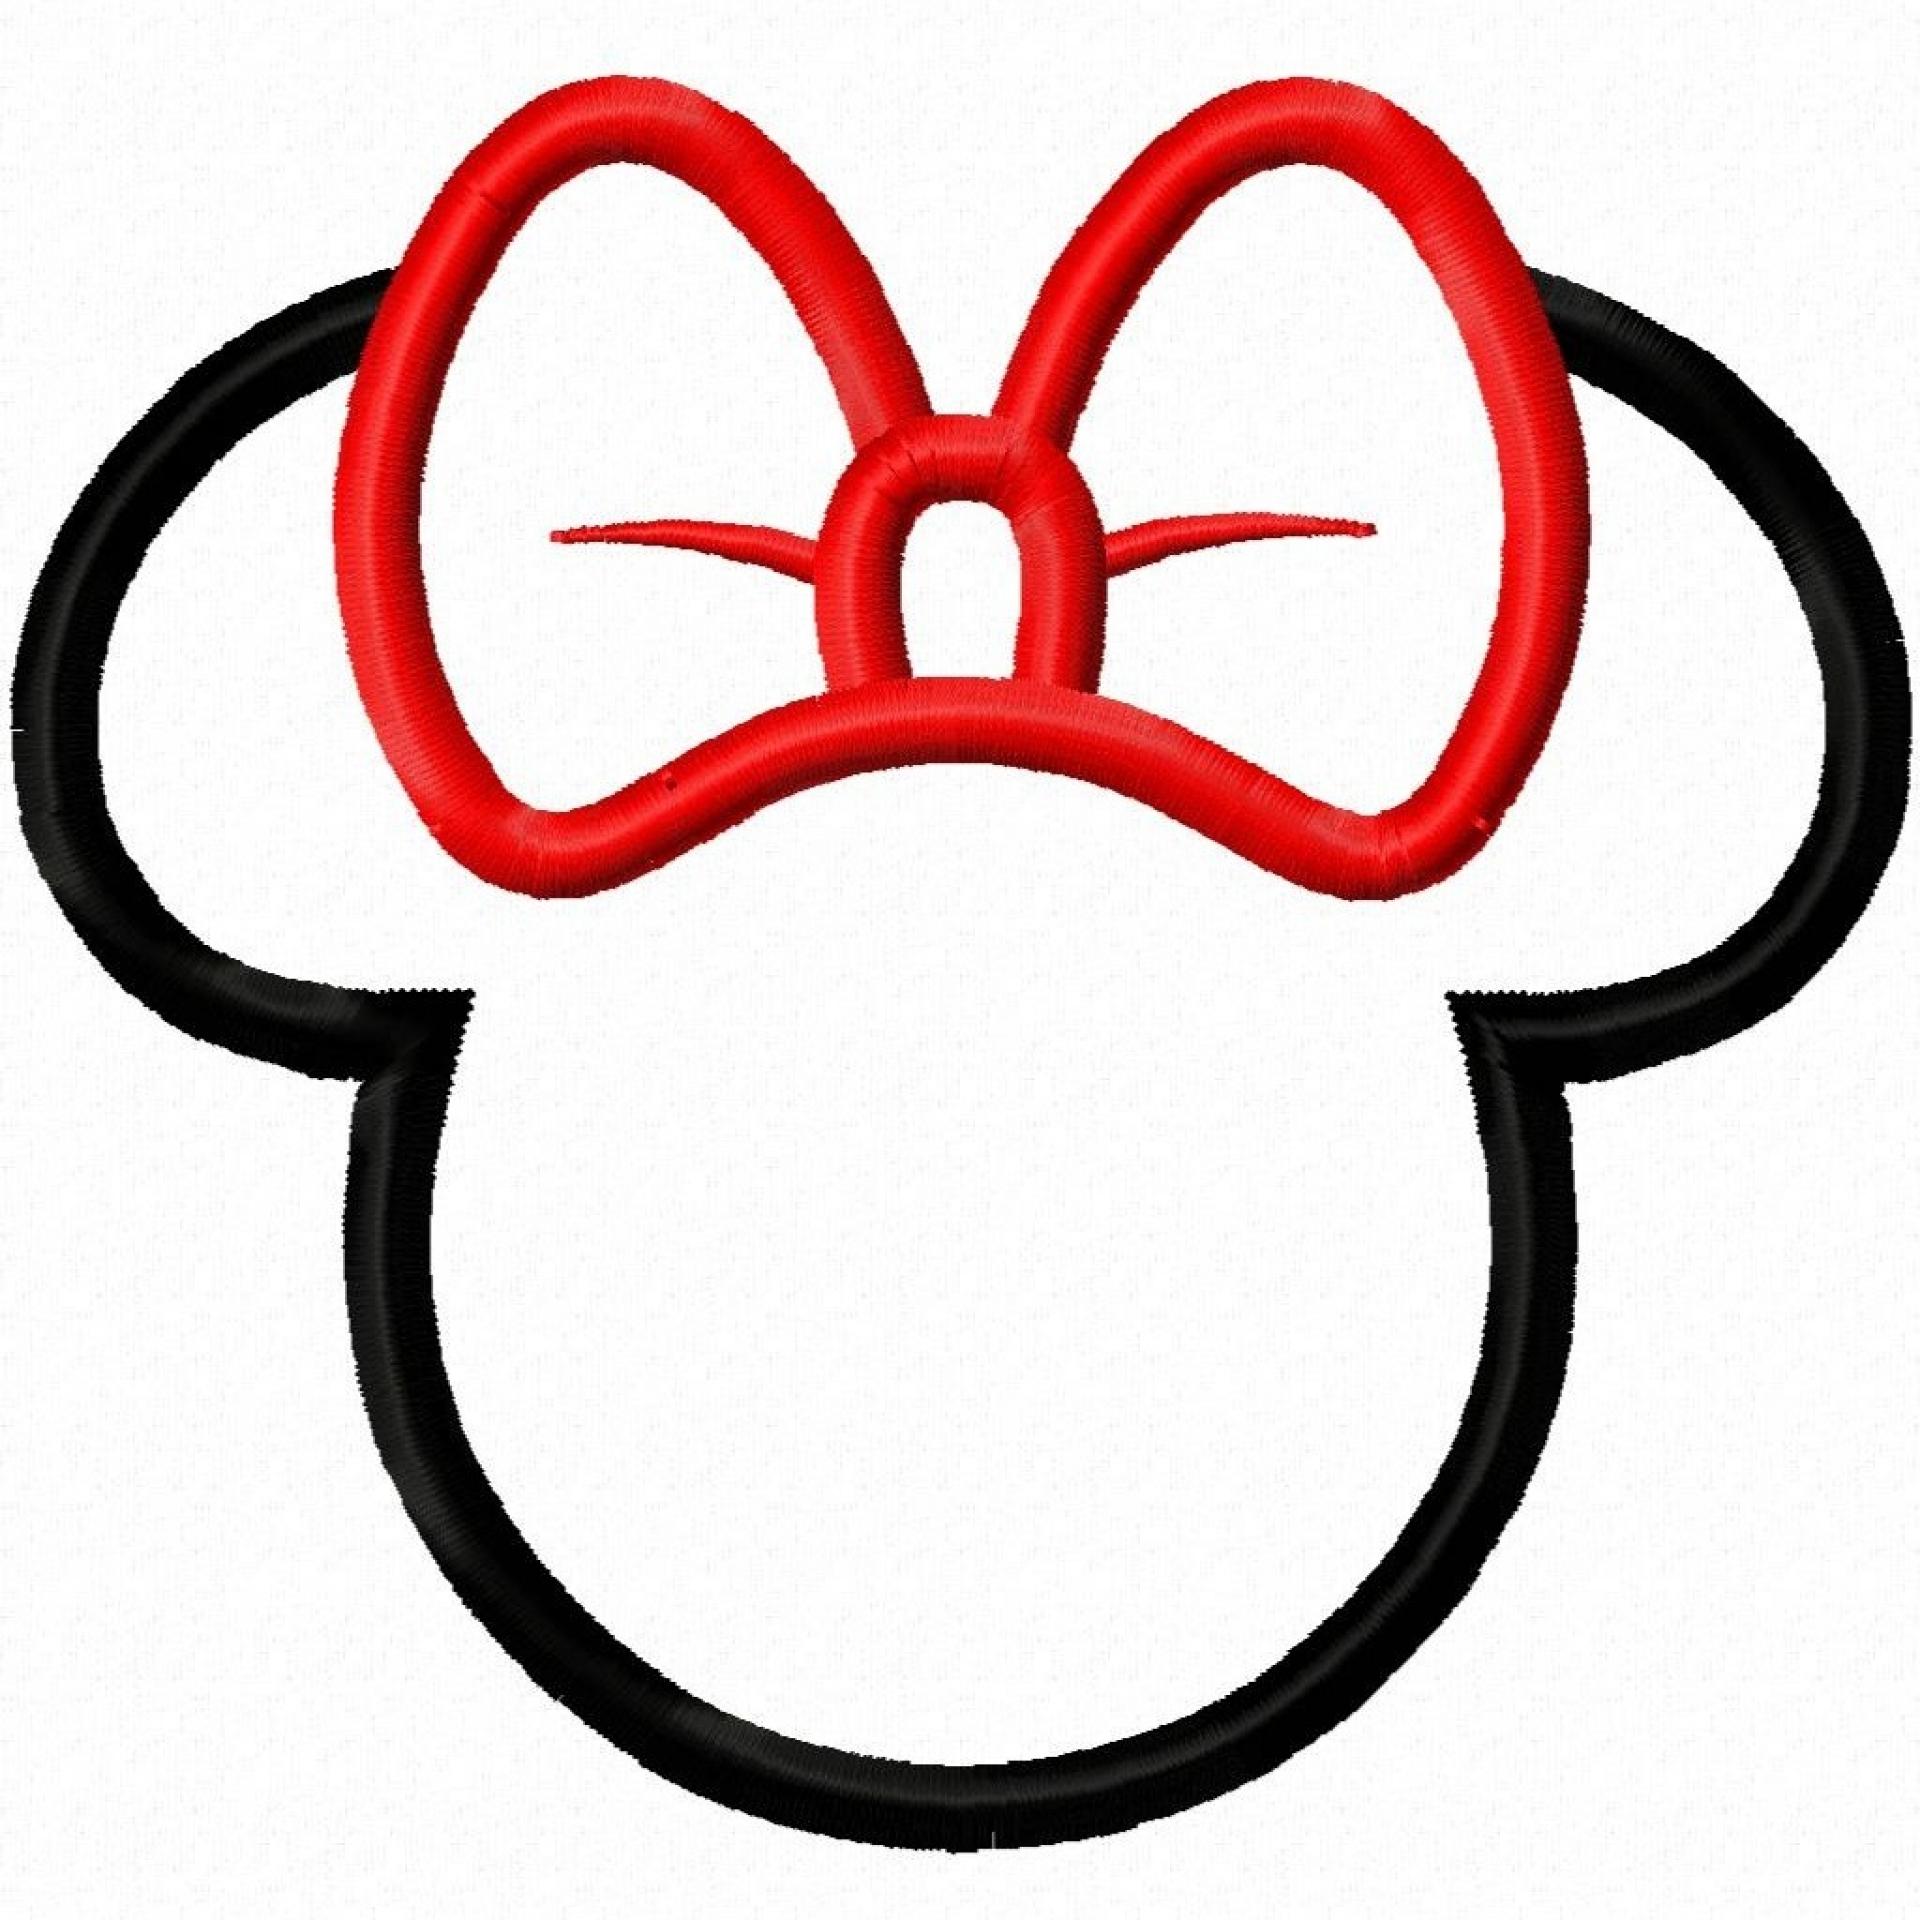 1920x1920 Minnie Mouse Ear Clip Art Free Clipart Images